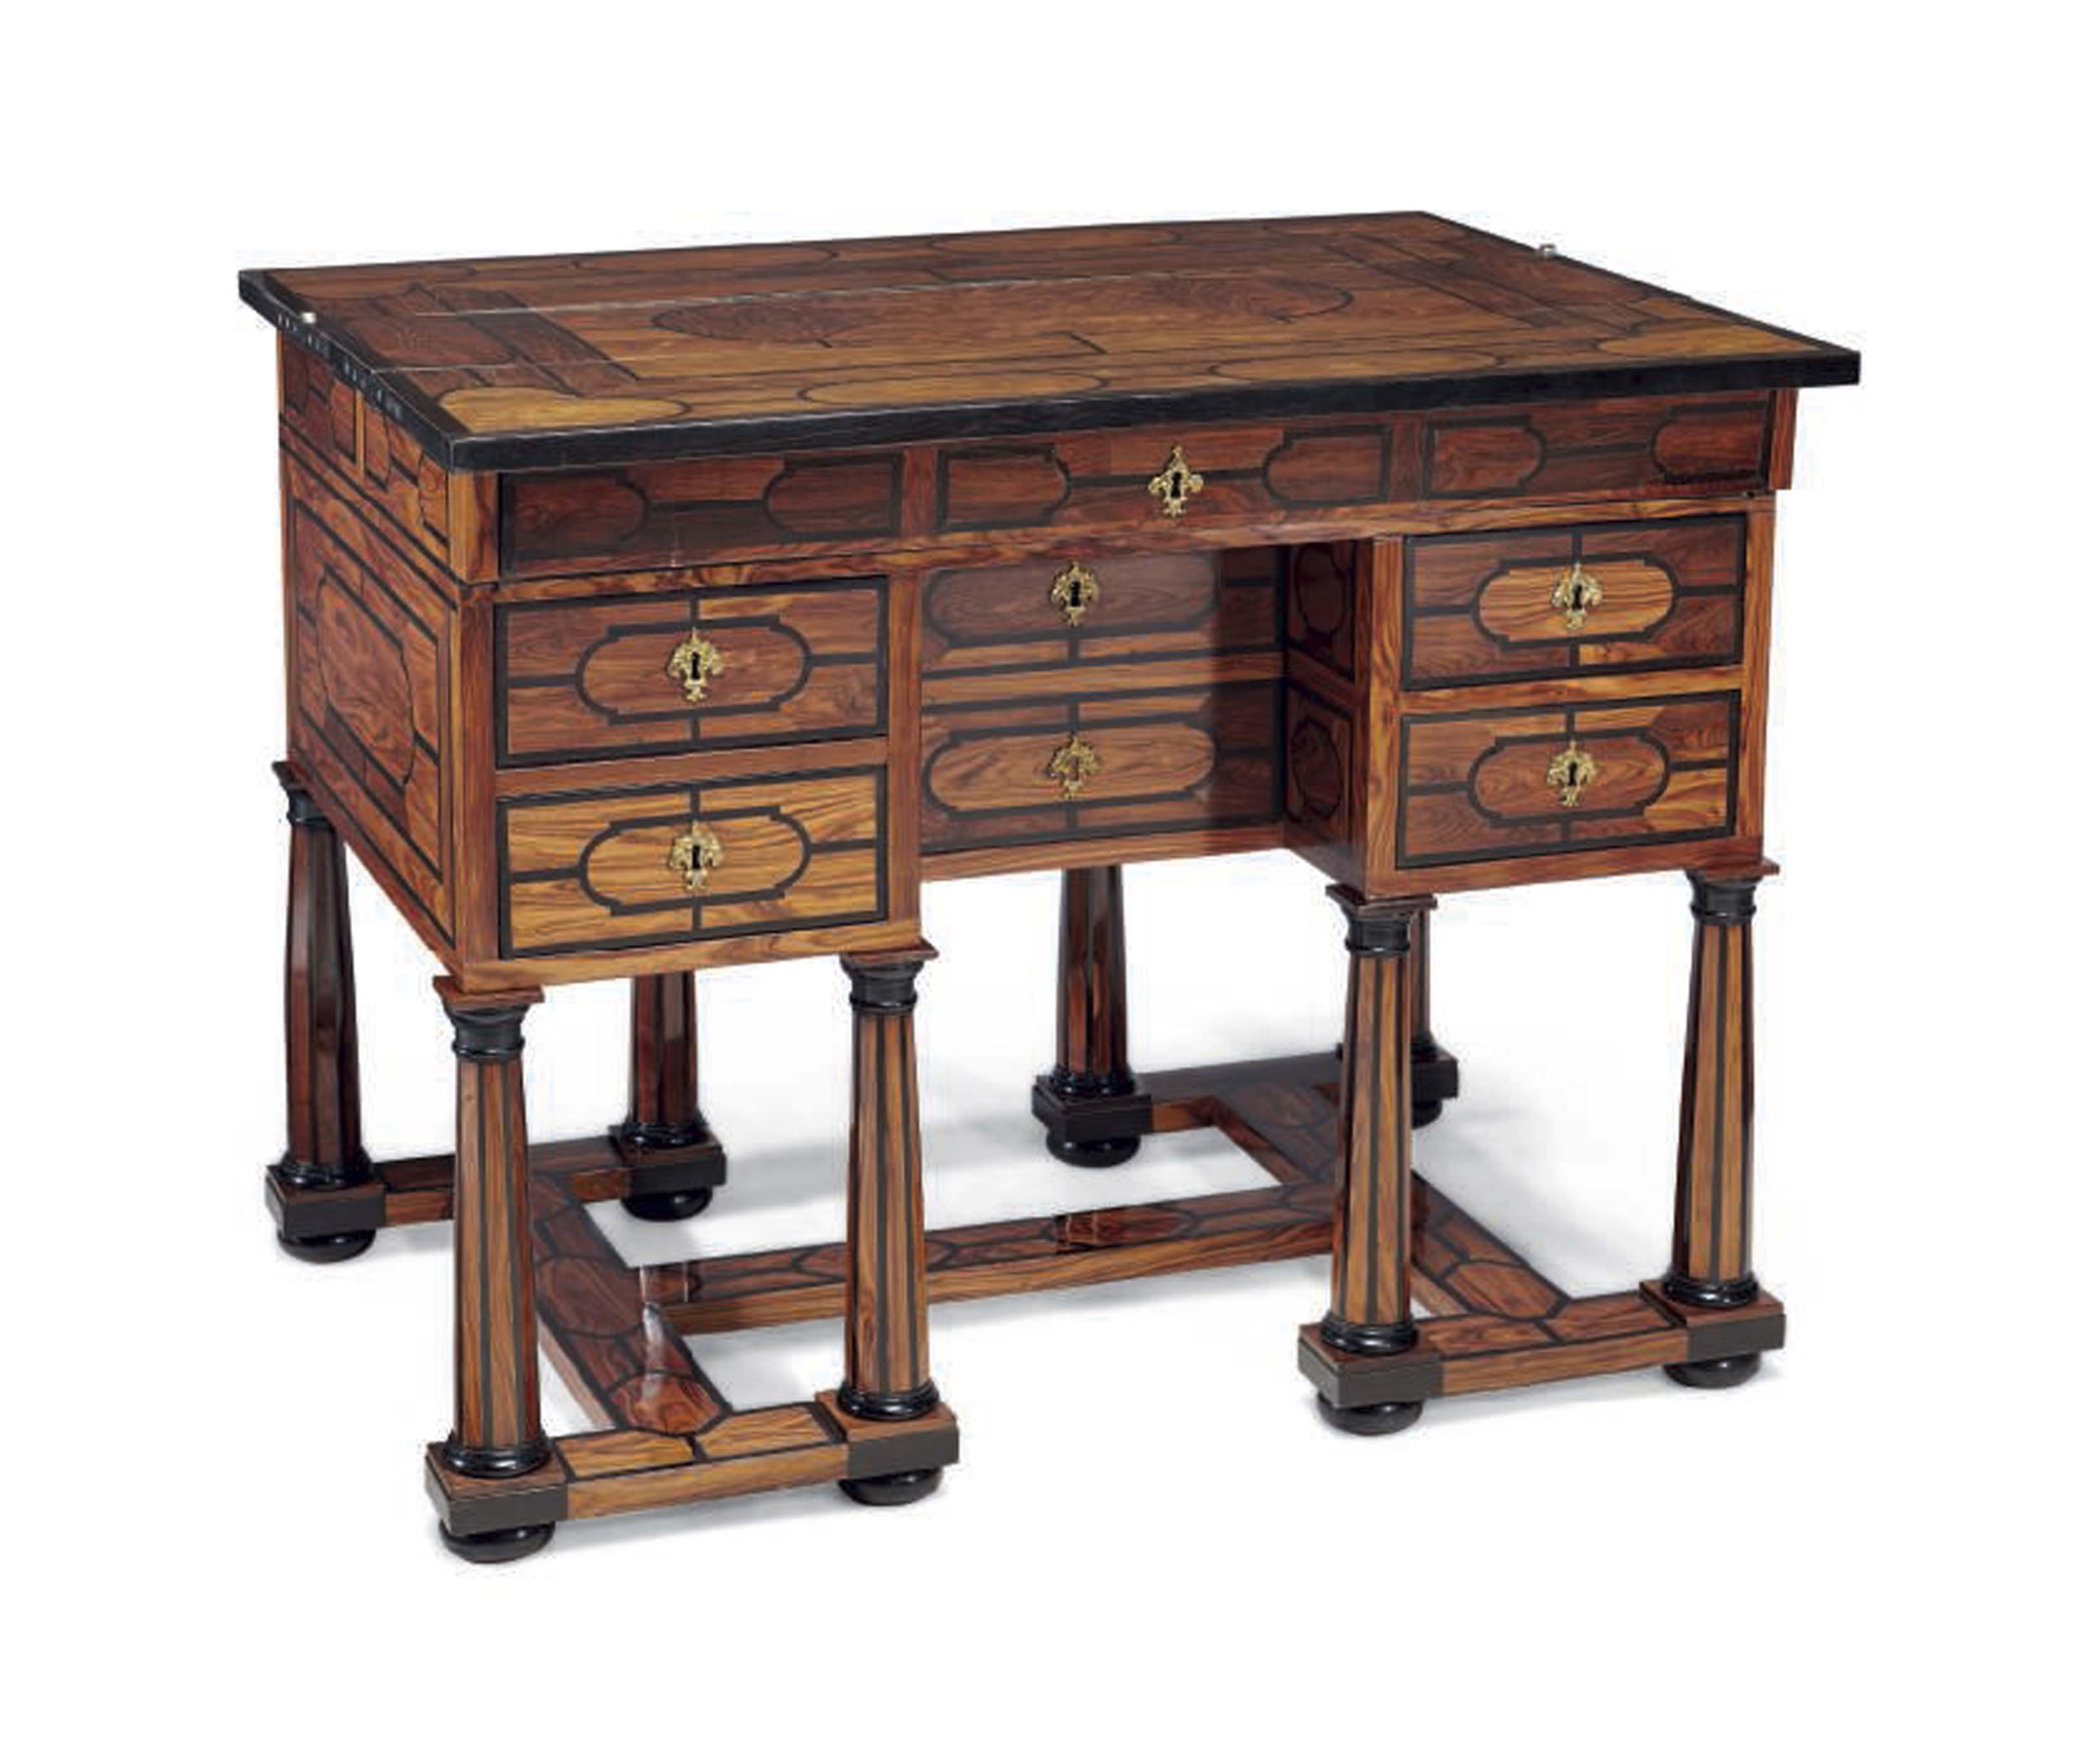 BUREAU MAZARIN DE STYLE LOUIS XIV XIXEME SIECLE Furniture